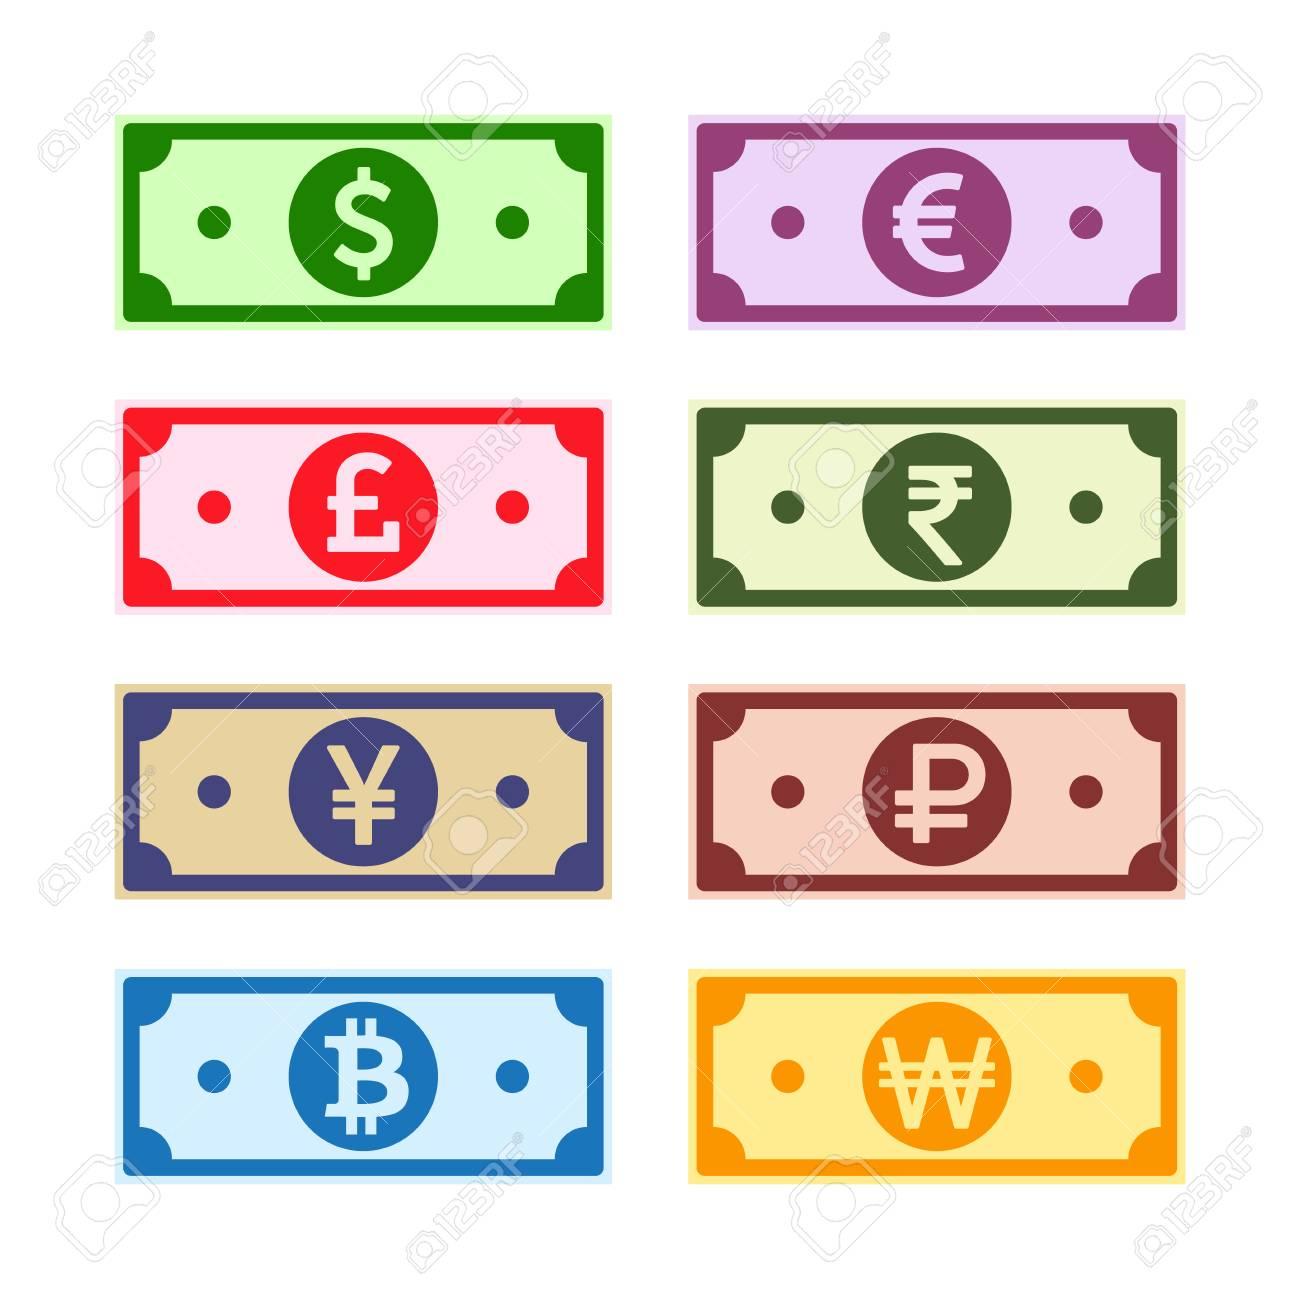 Money paper notes collection  US Dollar, UK Pound, Euro, Yen,